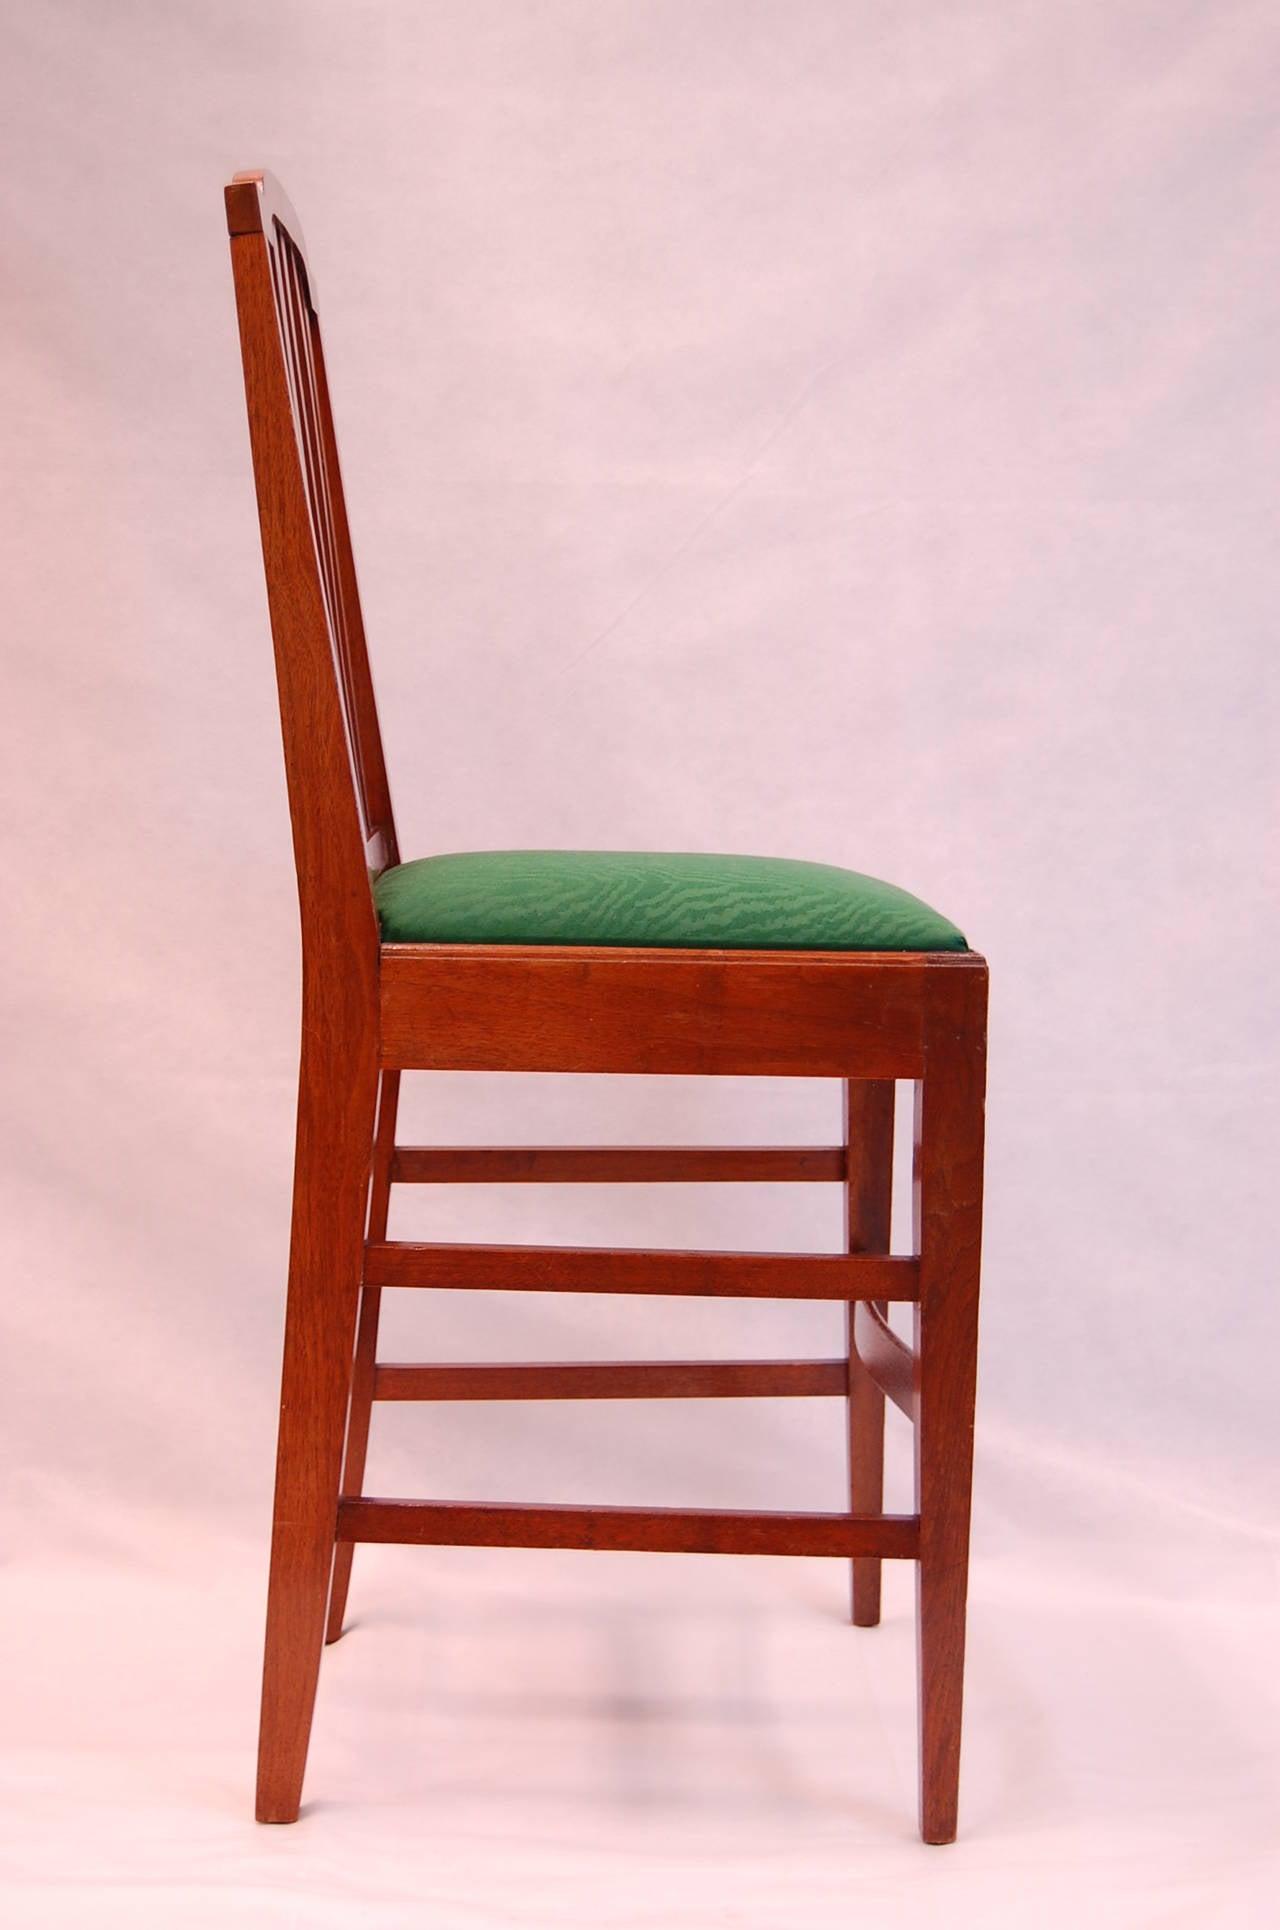 Mahogany Bar Chair For Sale at 1stdibs